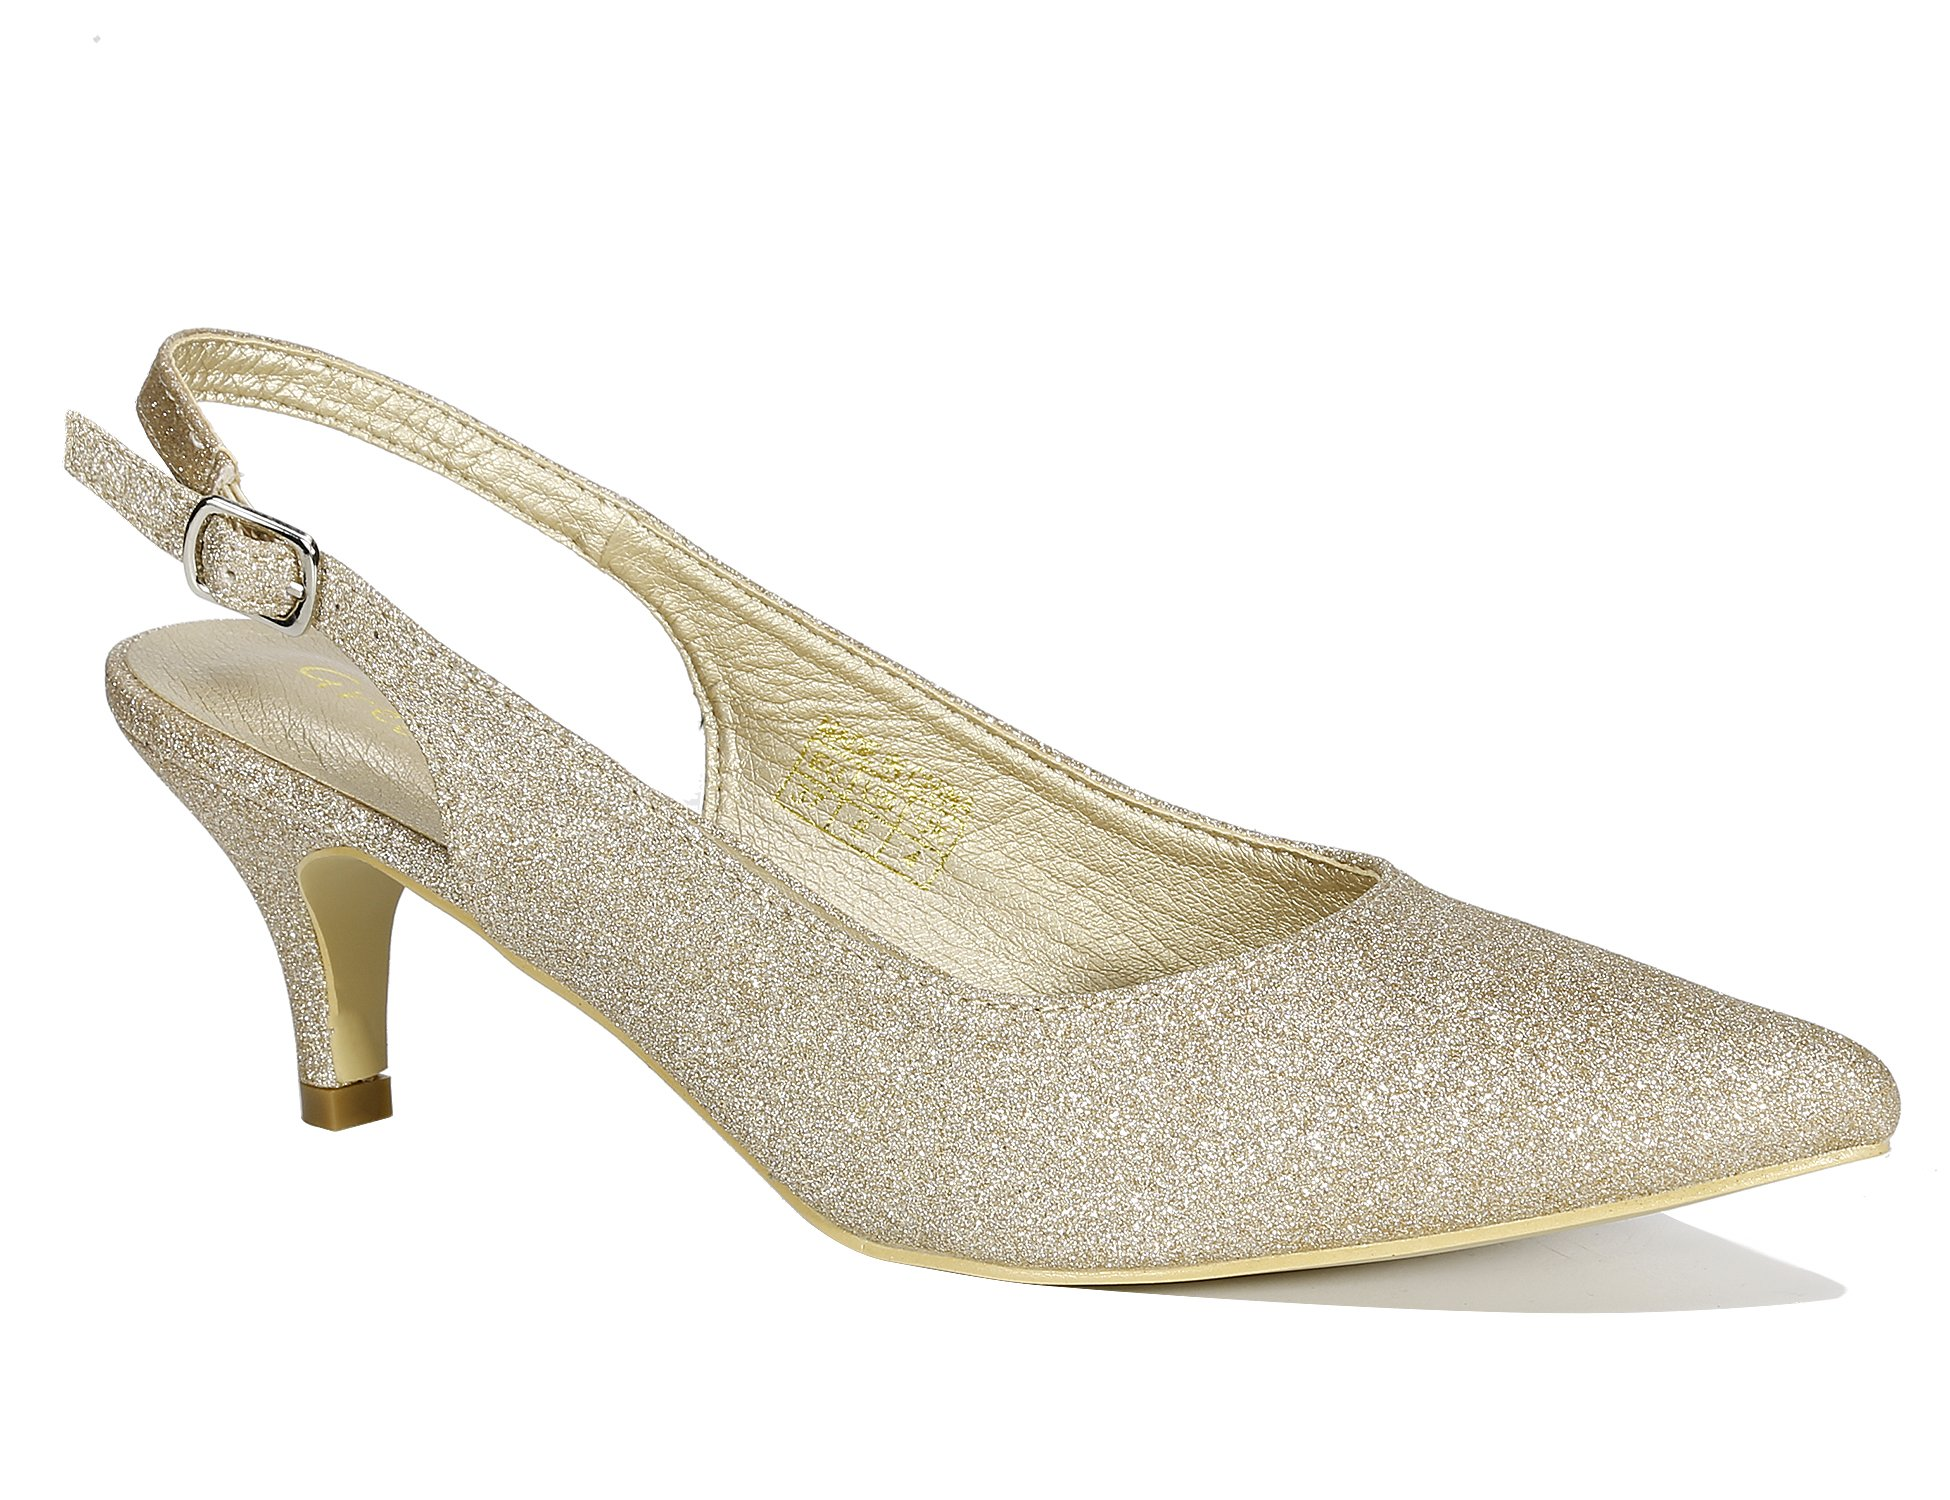 8fde44c630e Galleon - Greatonu Gold Women Shoes Glitter Kitten Heels Slingback Dress  Pumps Size 5